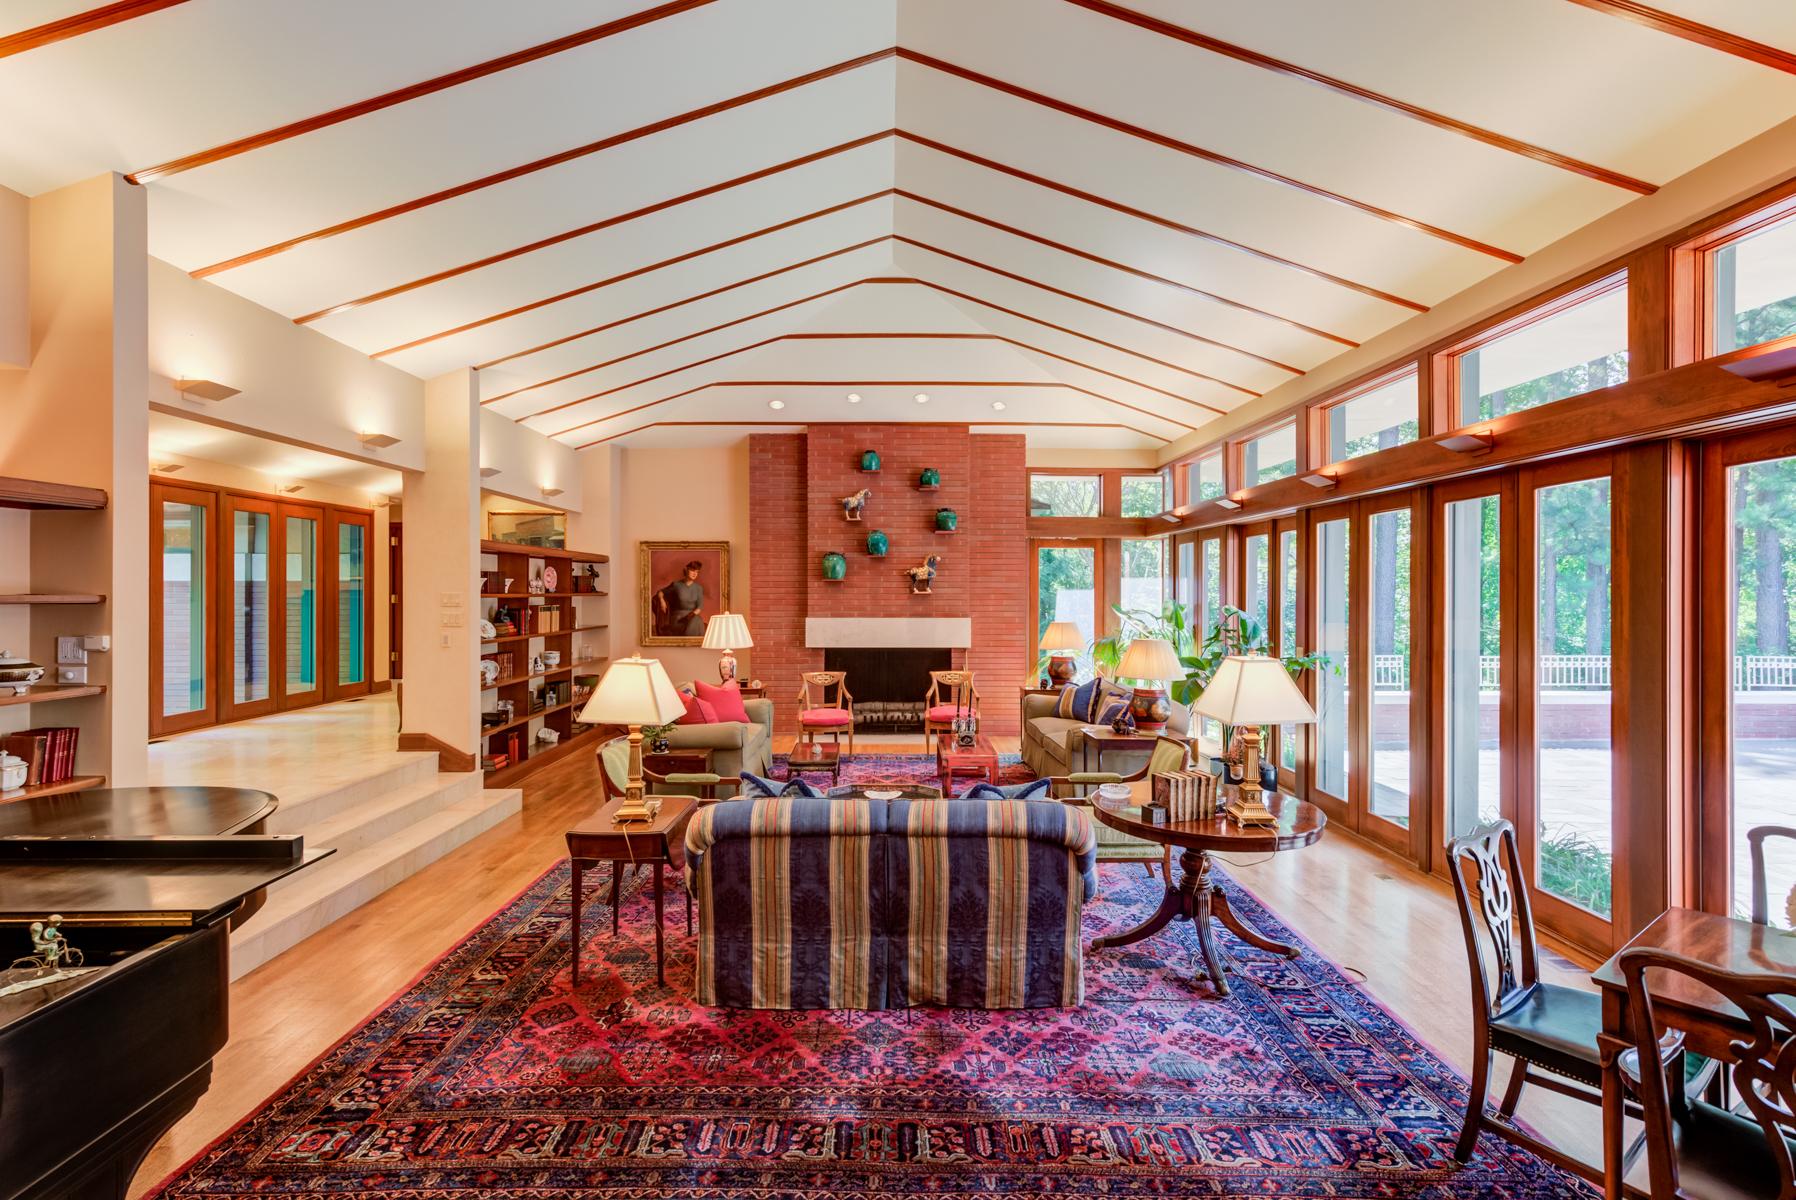 Additional photo for property listing at Warson Hills 7 Warson Hills Ladue, Missouri 63124 United States